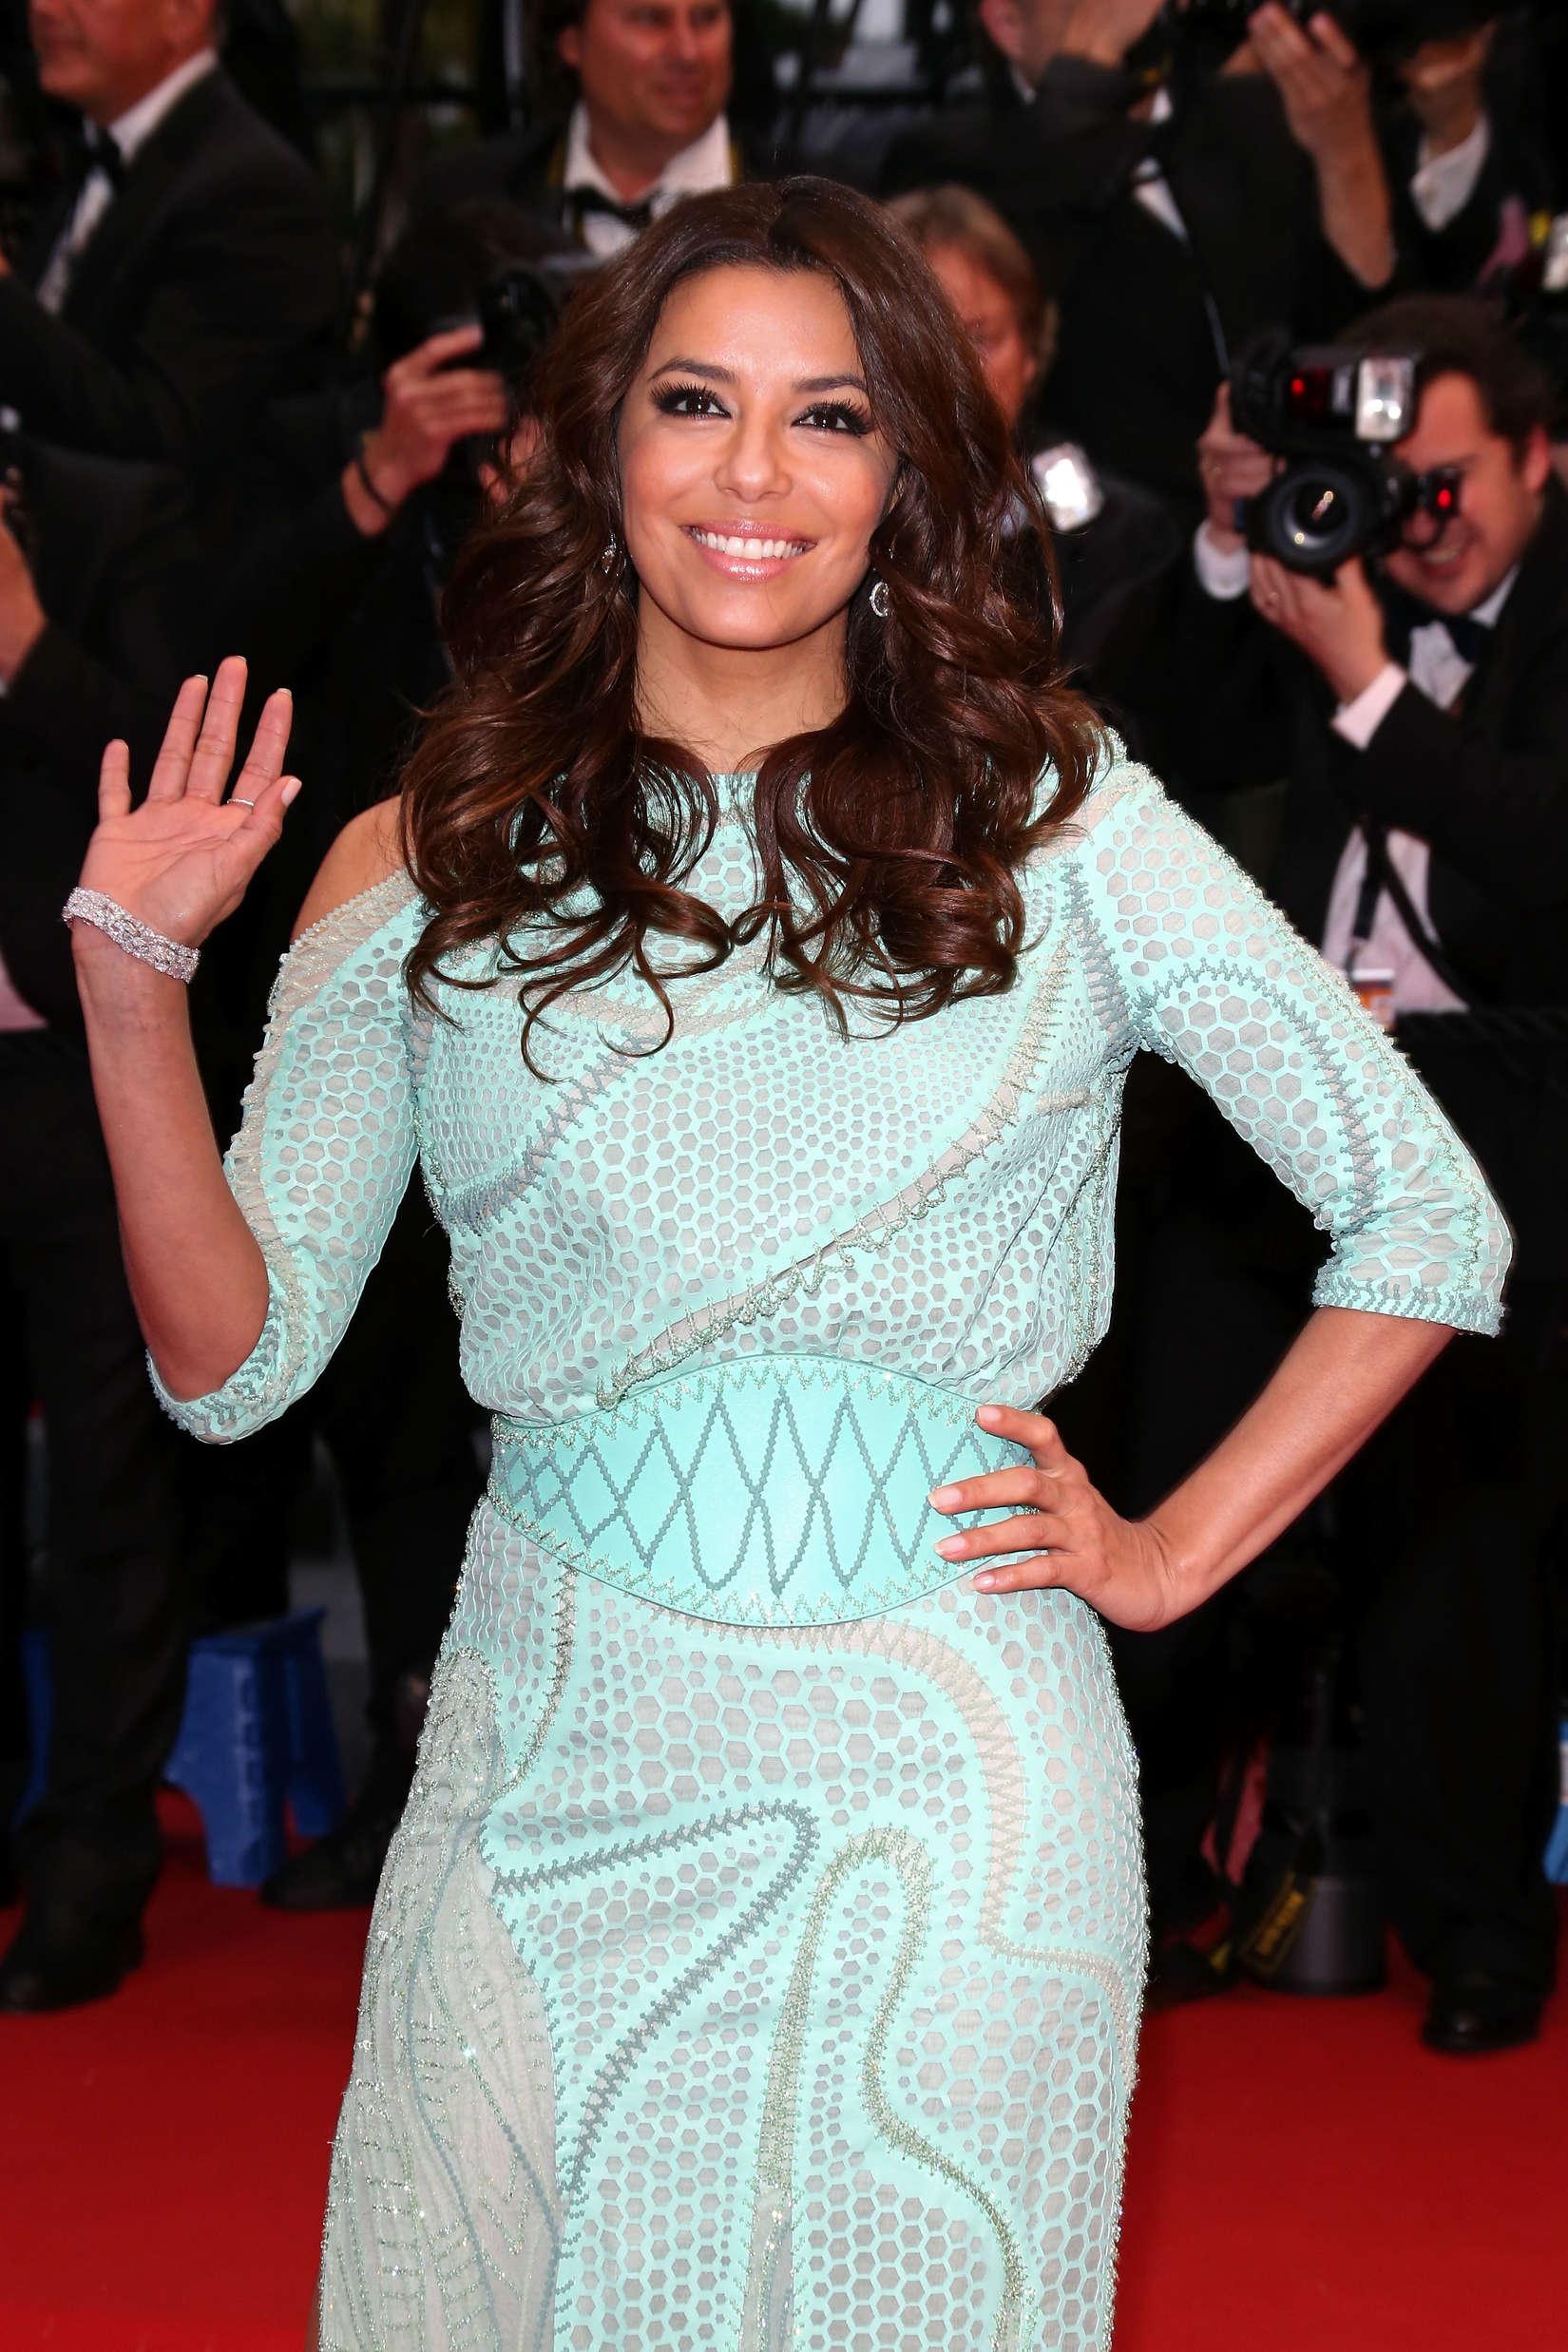 Eva Longoria Cannes 2013 Wardrobe Malfunction